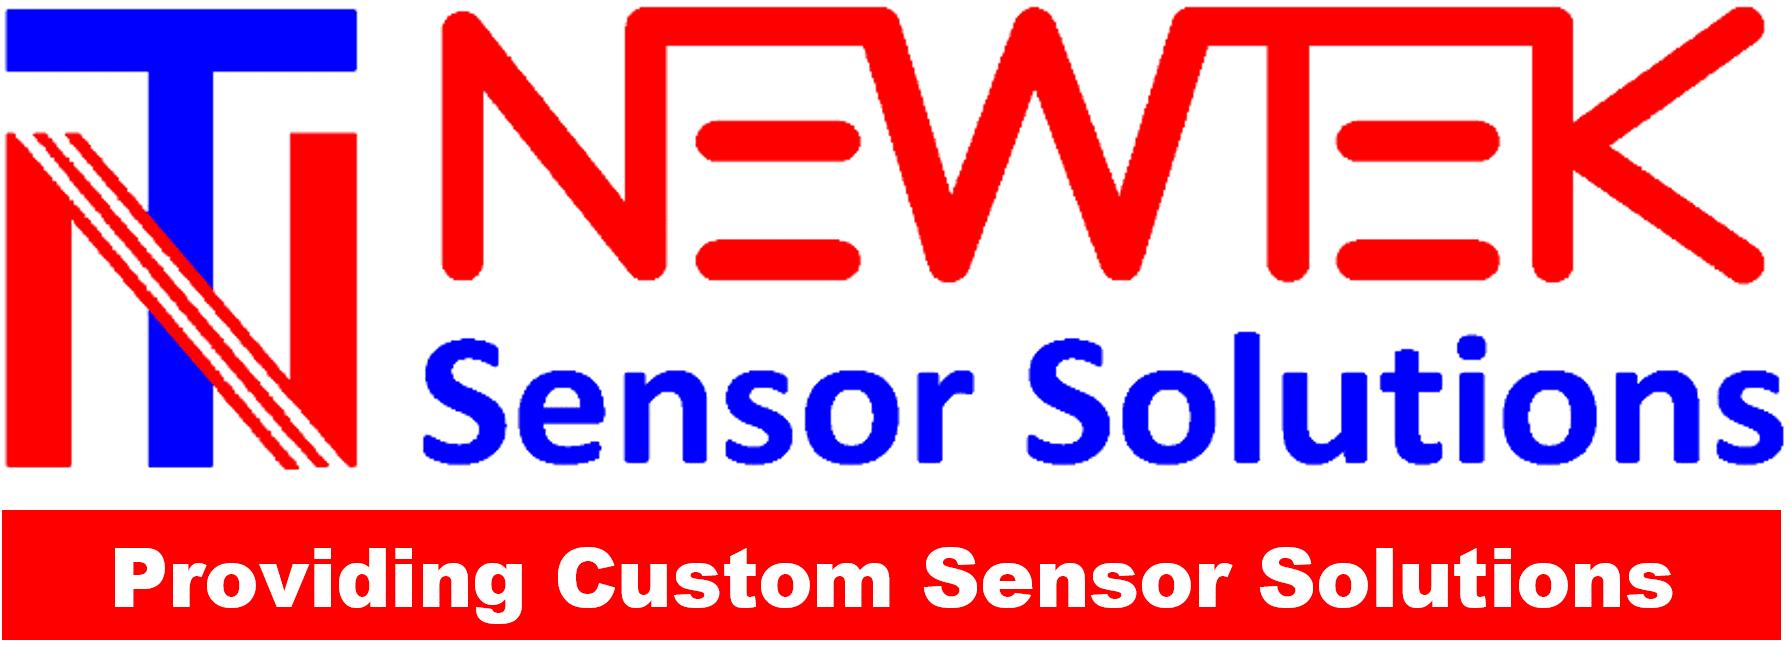 Newtek Sensors | LVDT Position Sensors and Signal Conditioners